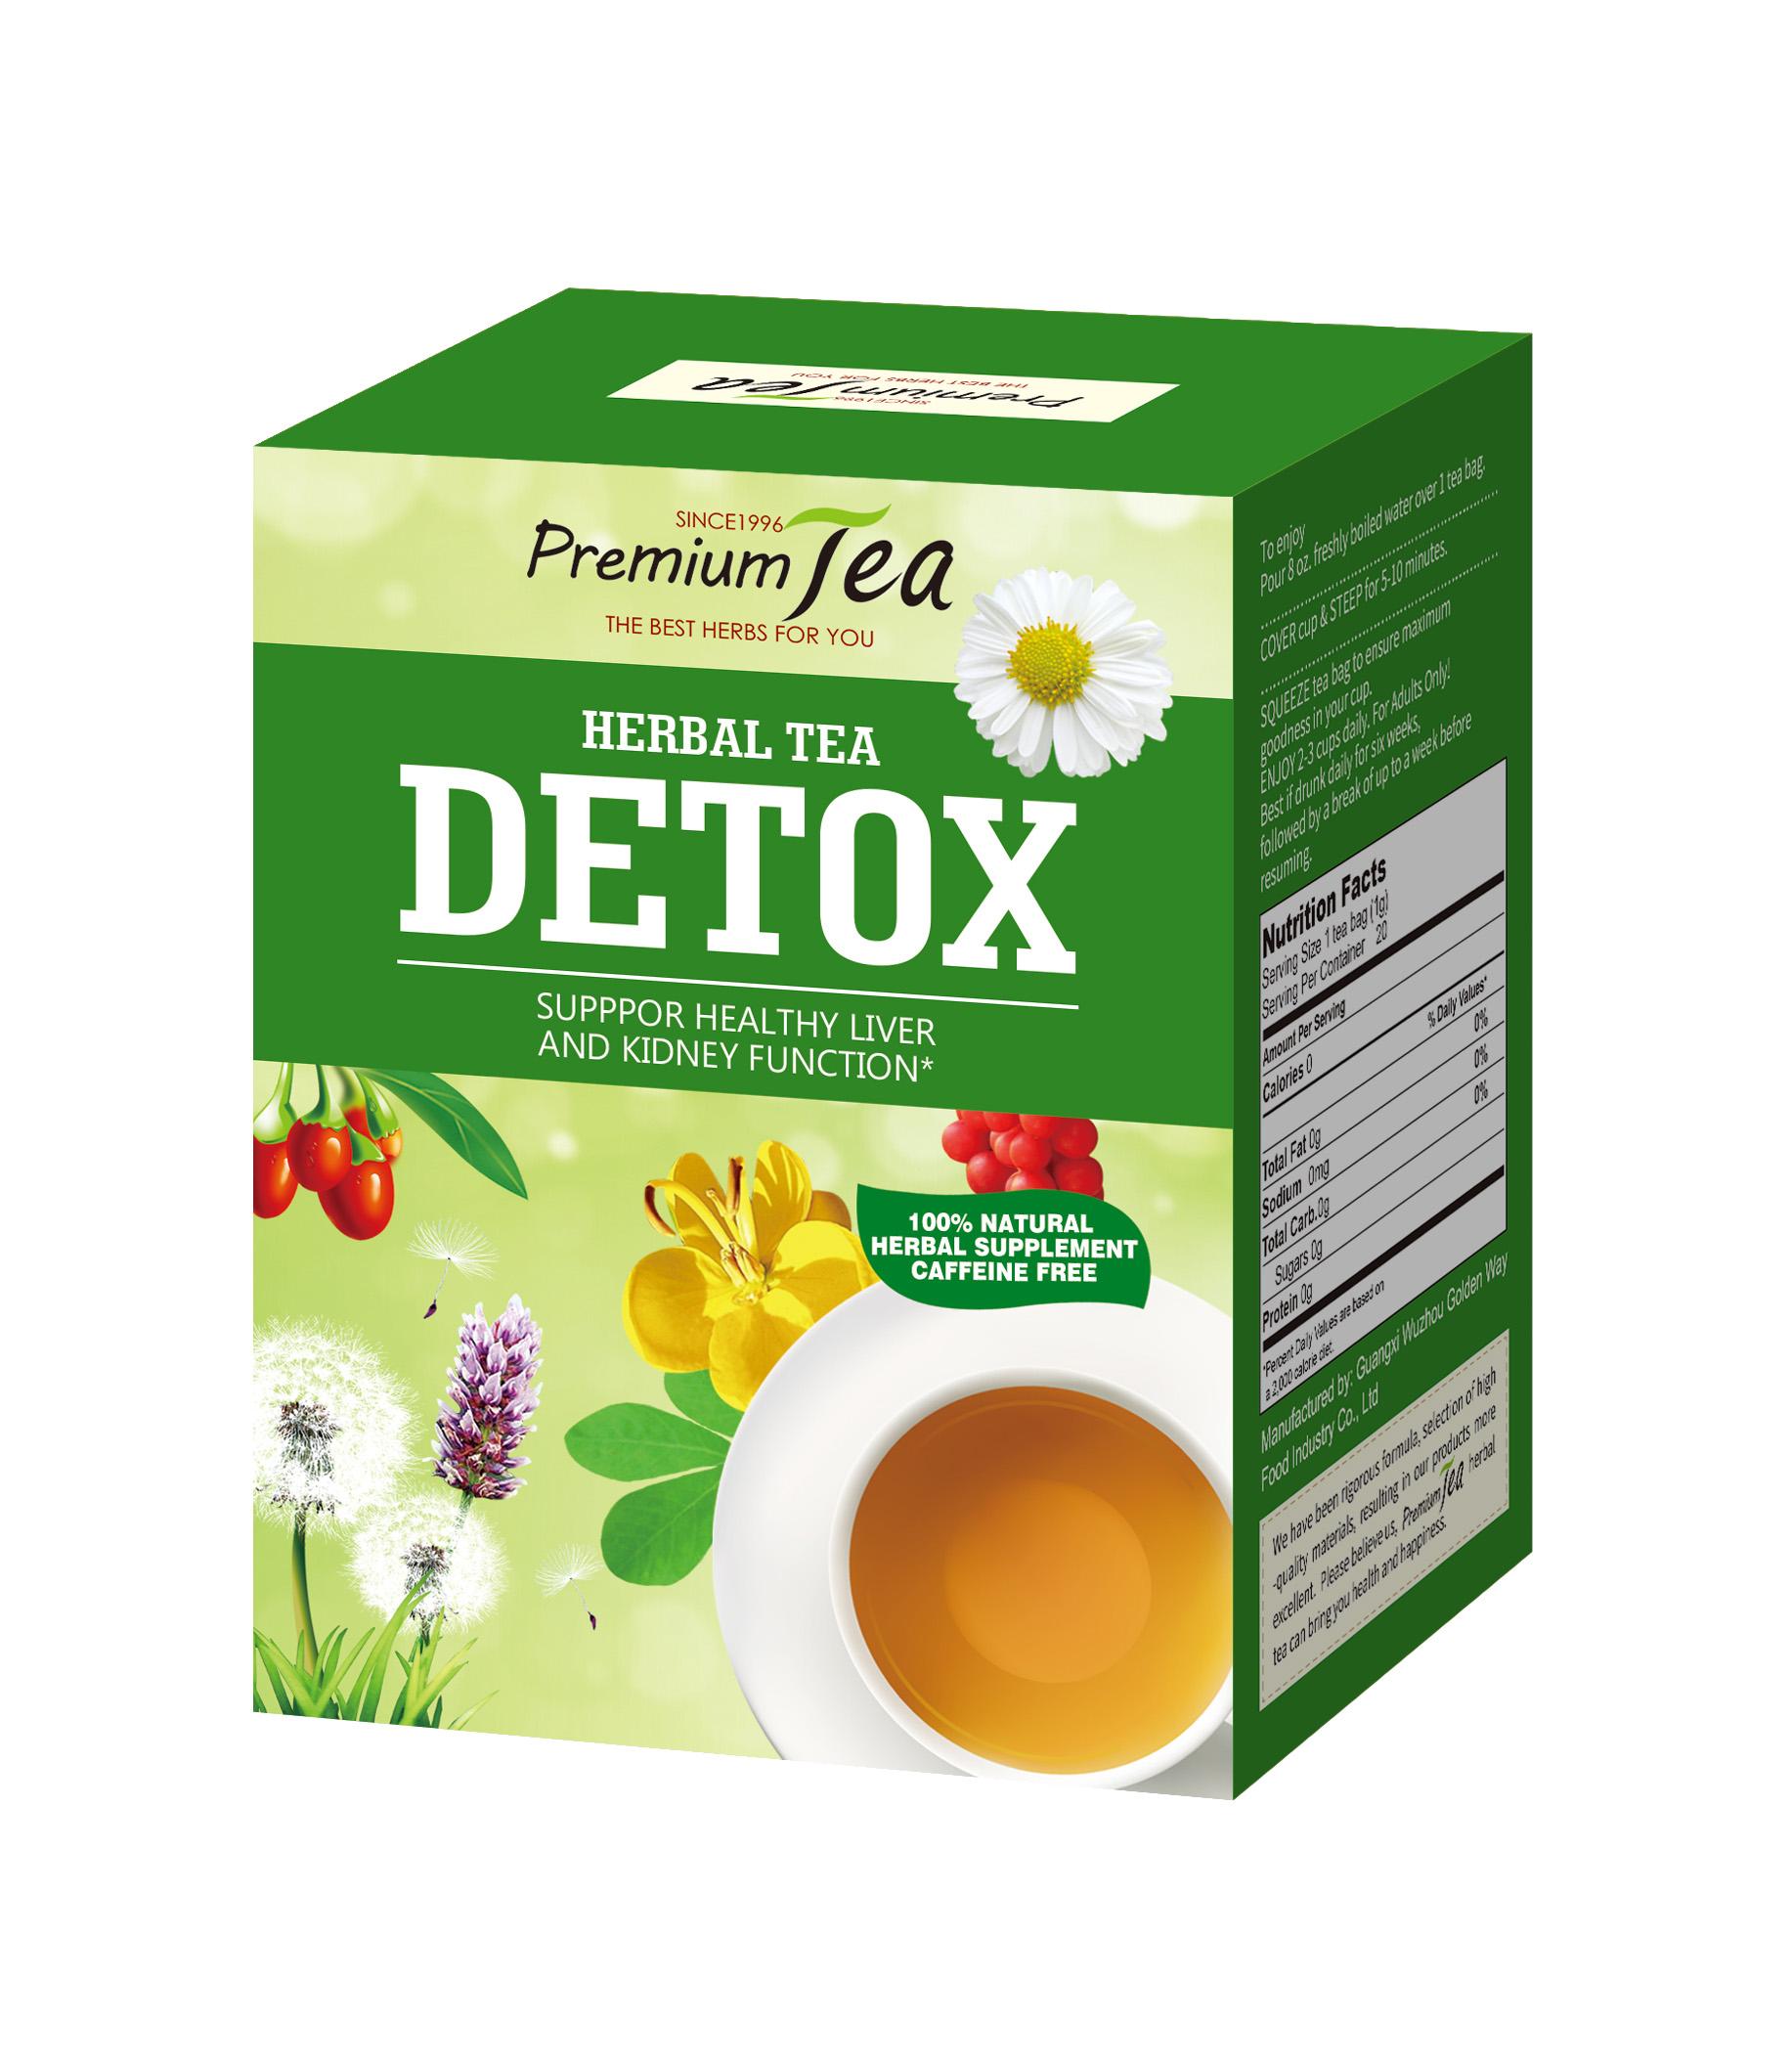 Healthy Liver and Kideny Detox Tea - 4uTea   4uTea.com